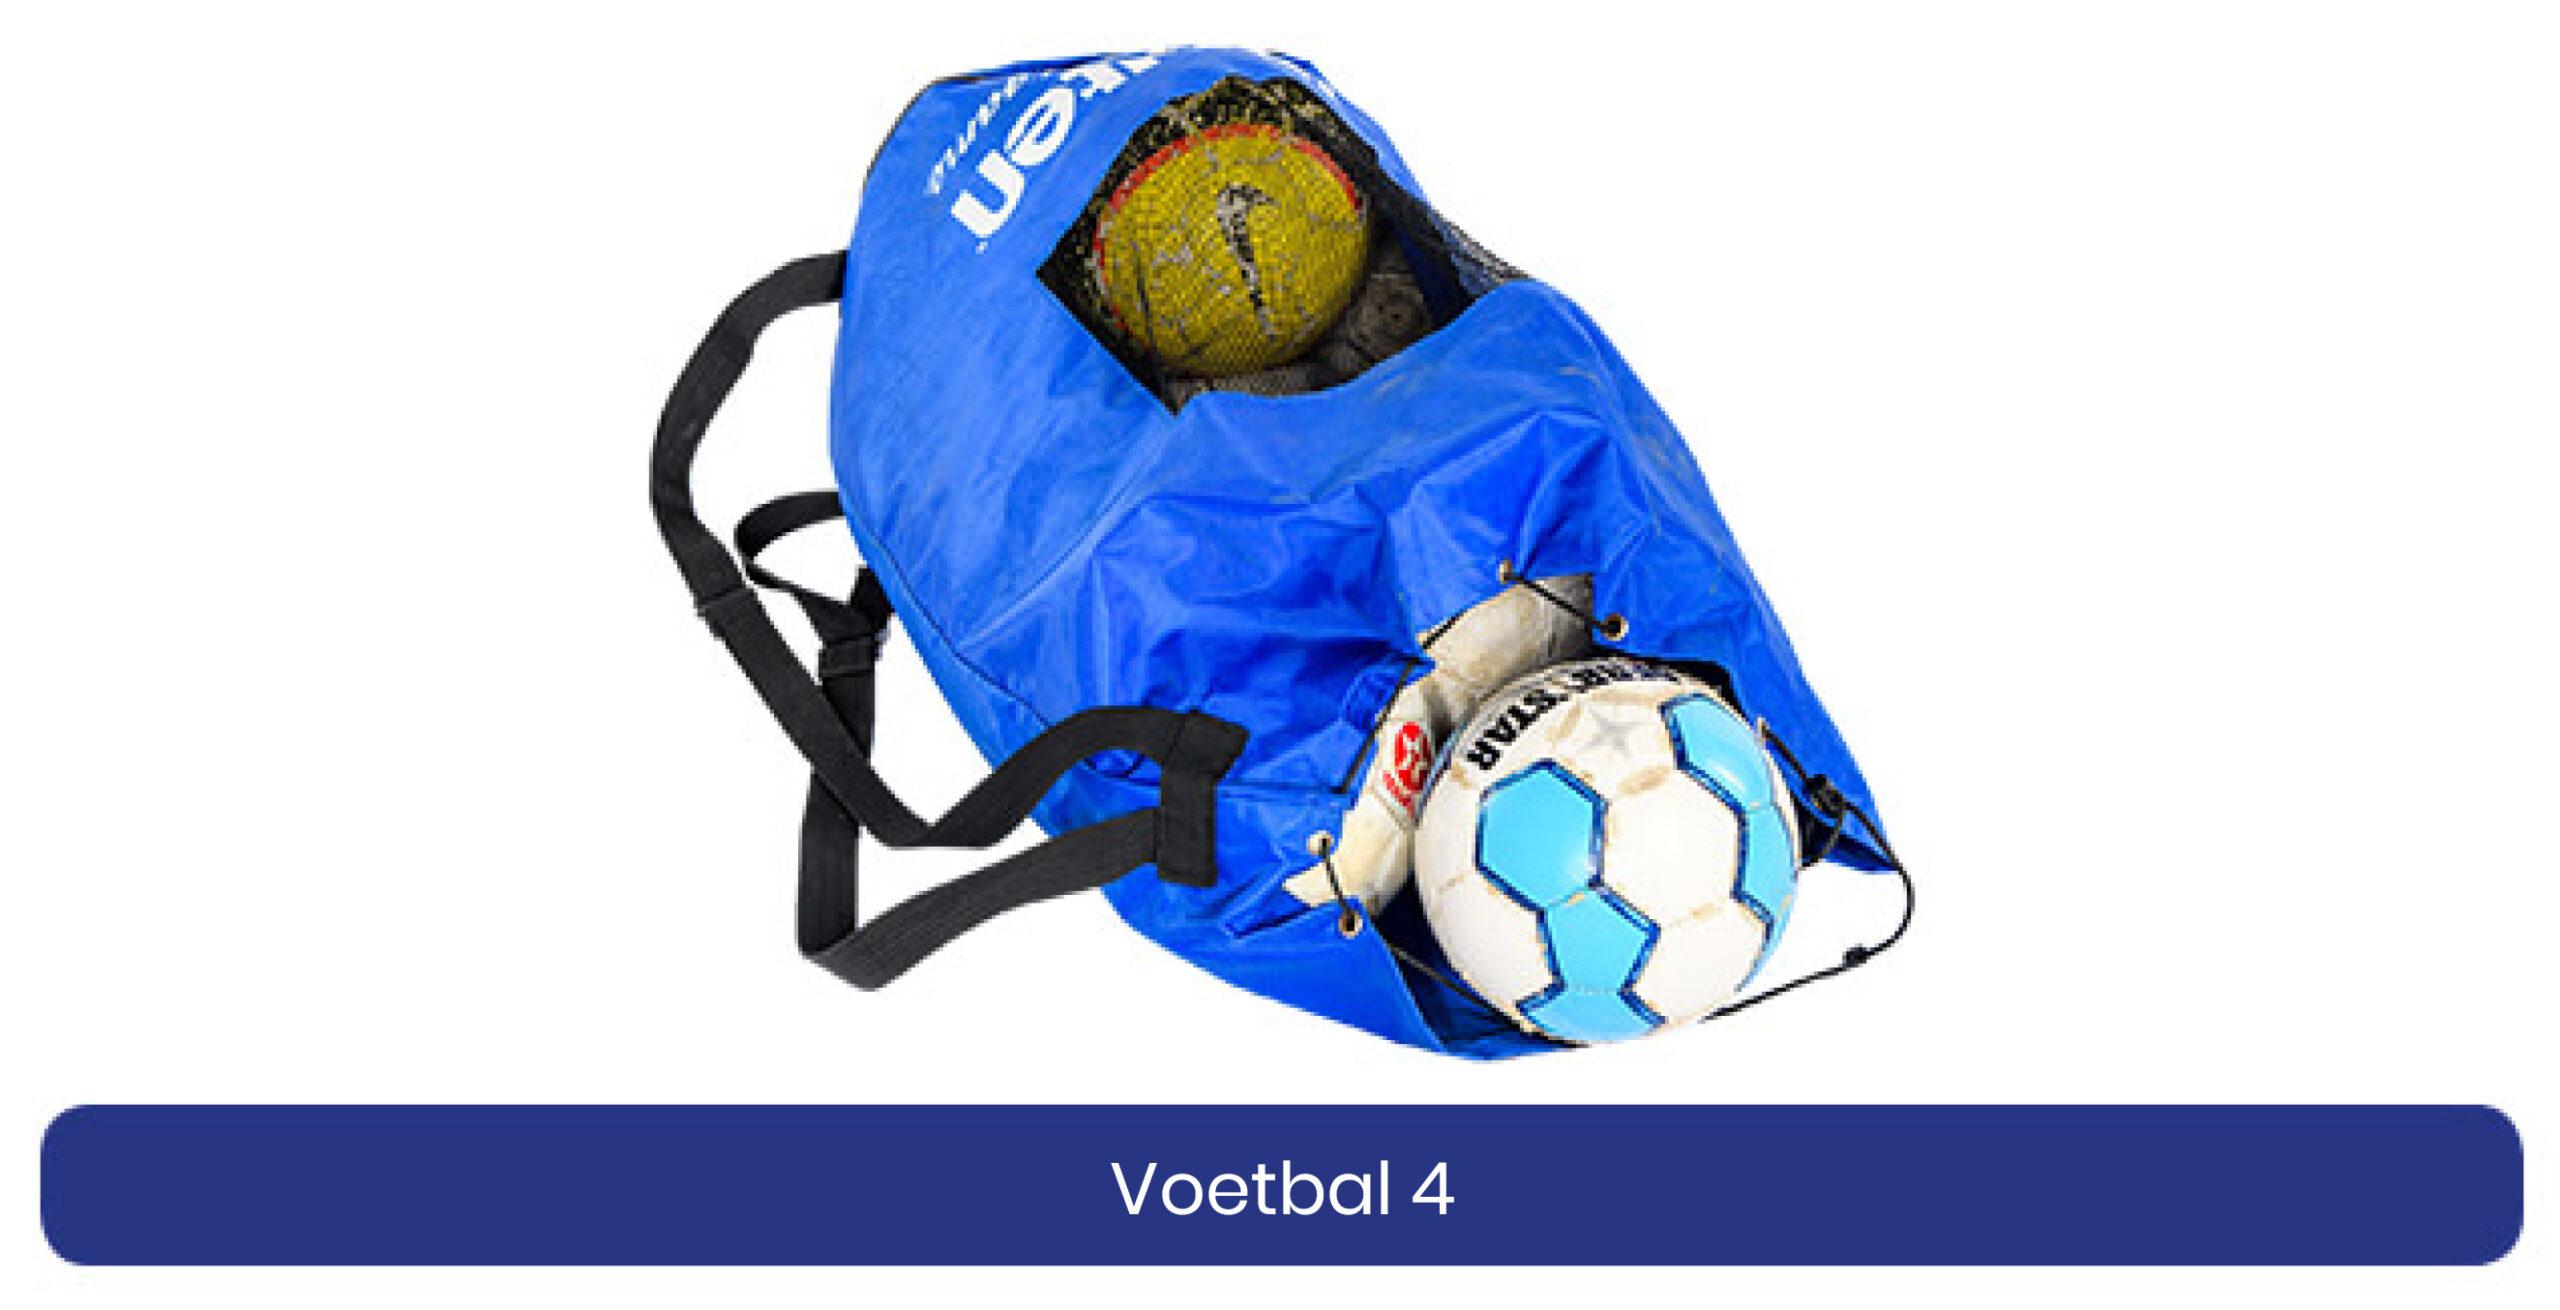 Voetbal 4 lenen product